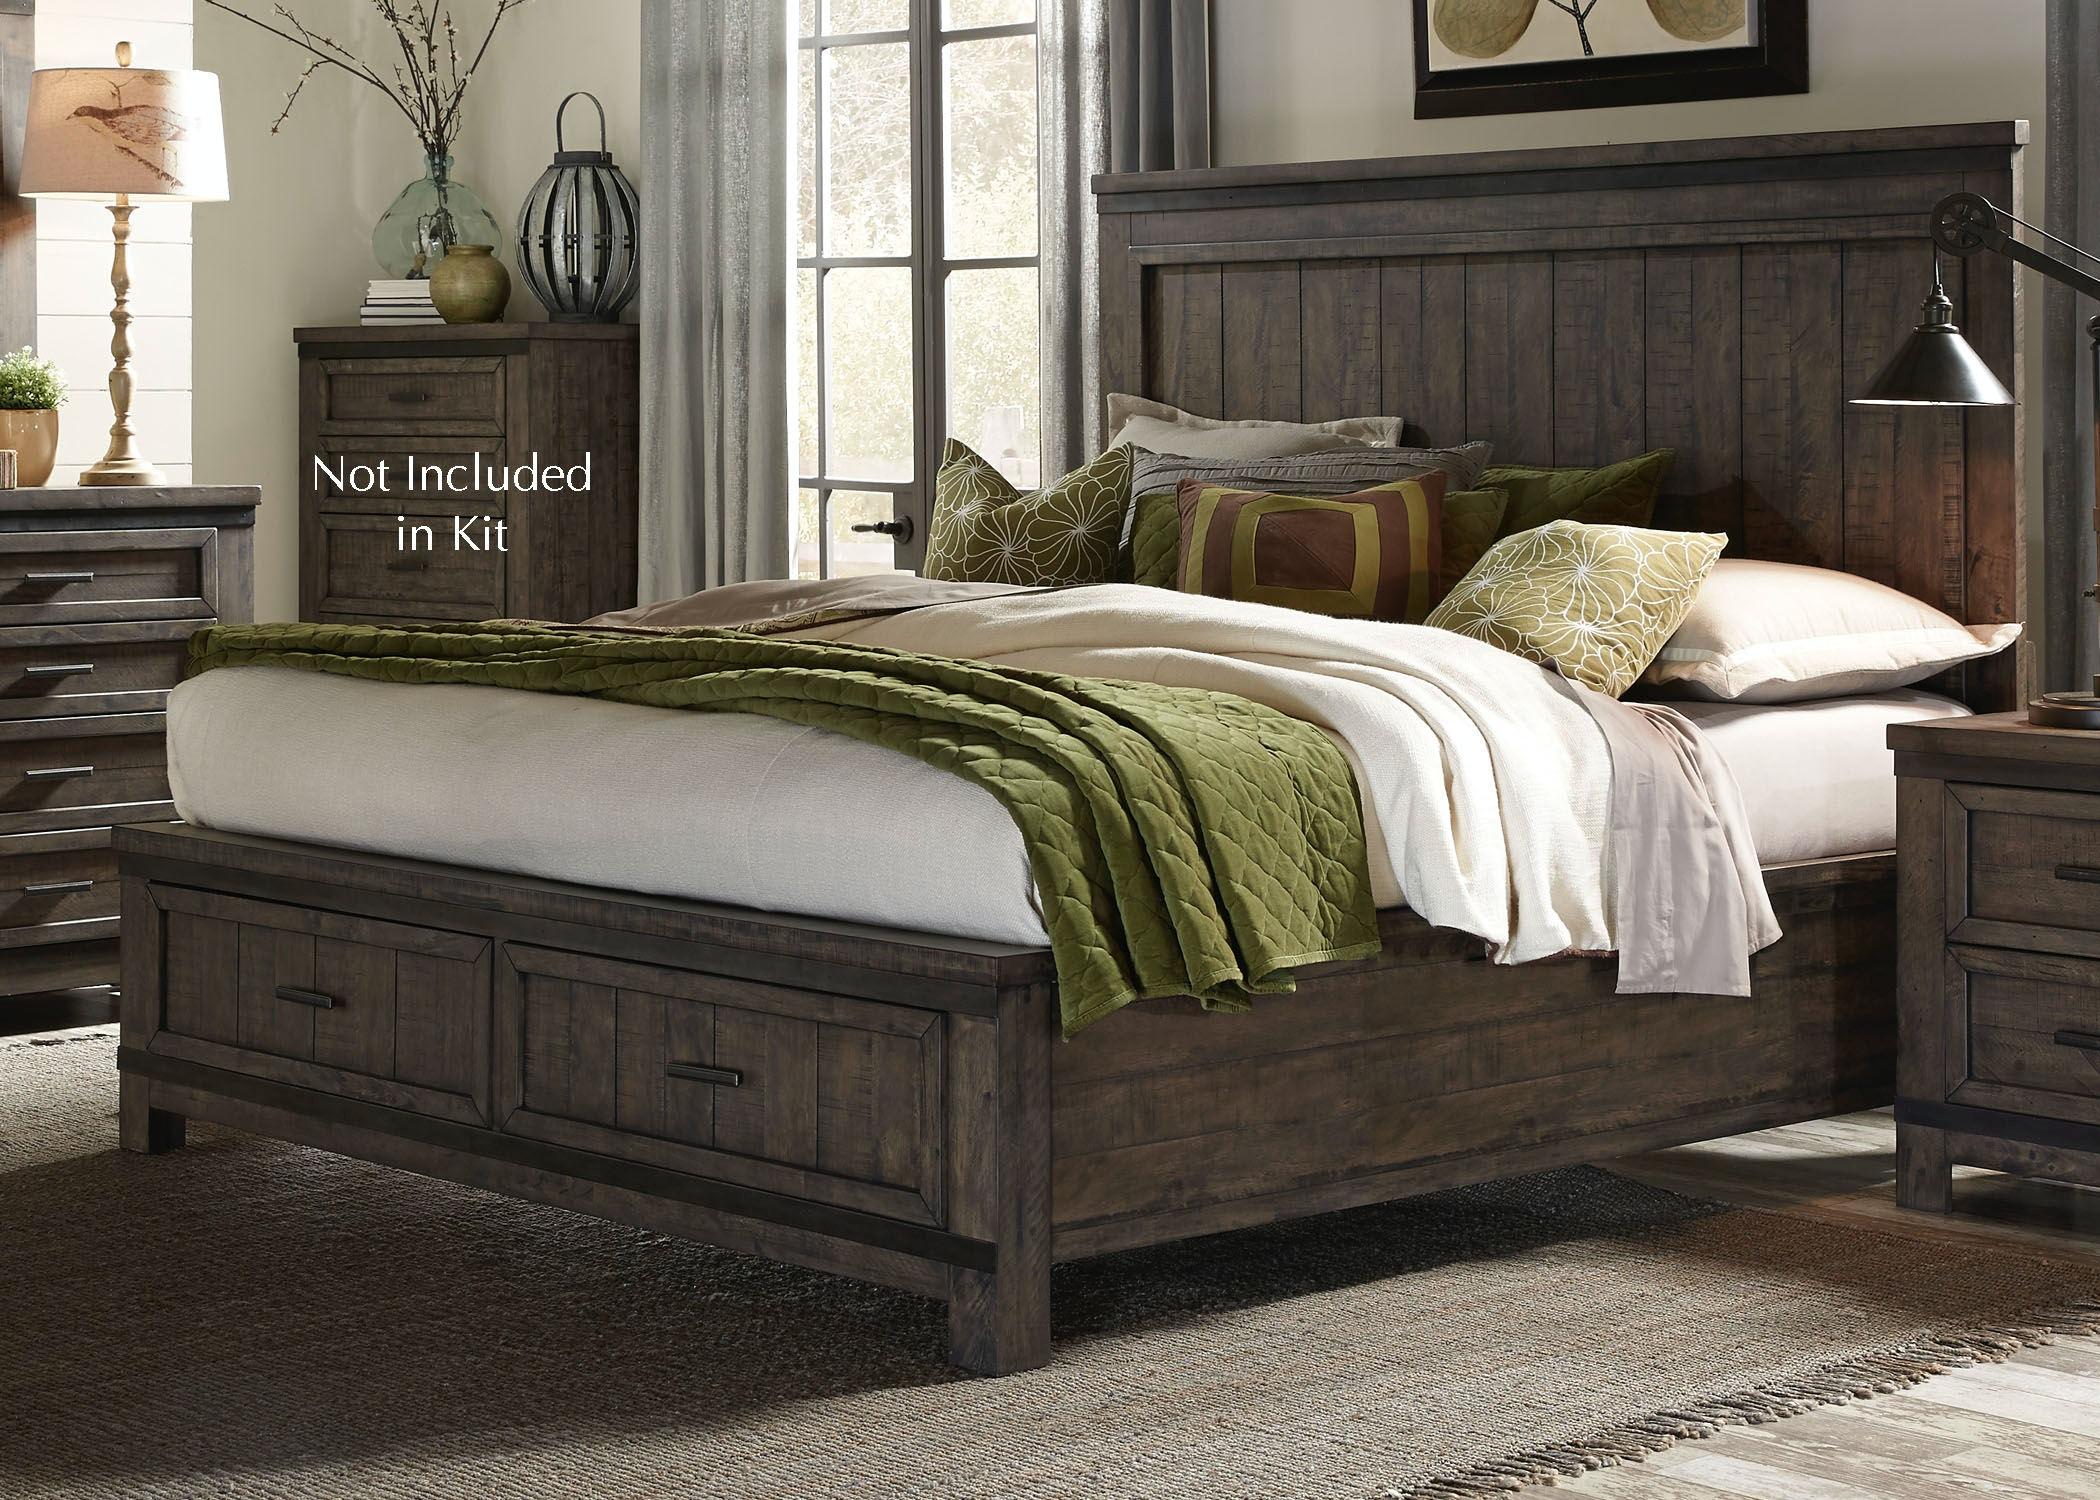 Elegant Liberty Furniture King Storage Bed 759 BR KSB ...